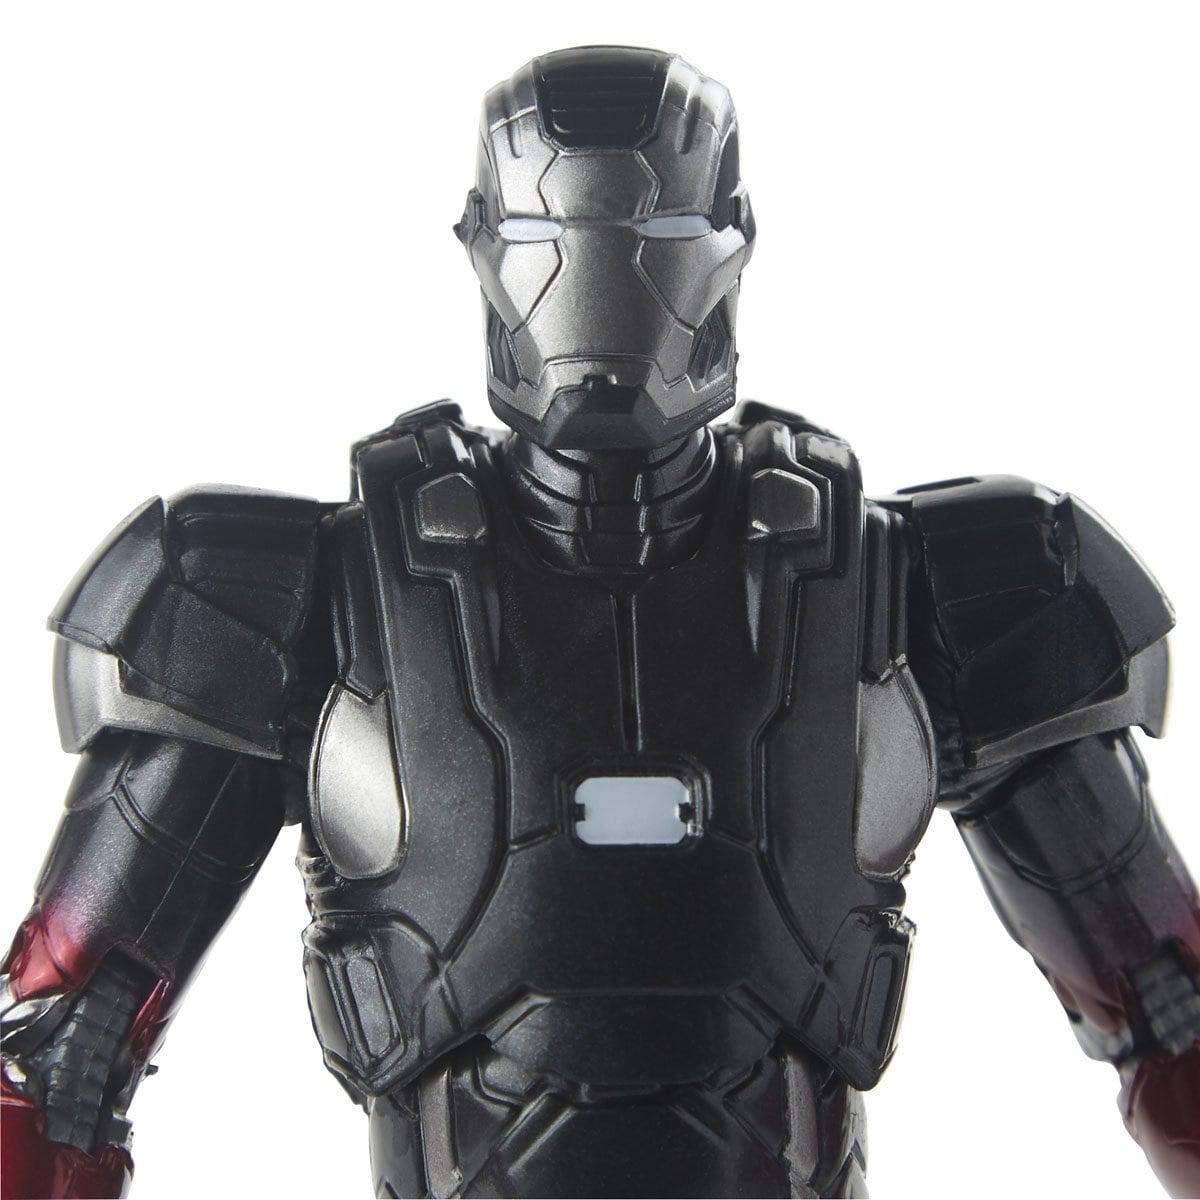 Marvel Pepper Pots, Iron Man Mark Xxii & The Mandarin Marvel 10Th Anniversary Hasbro